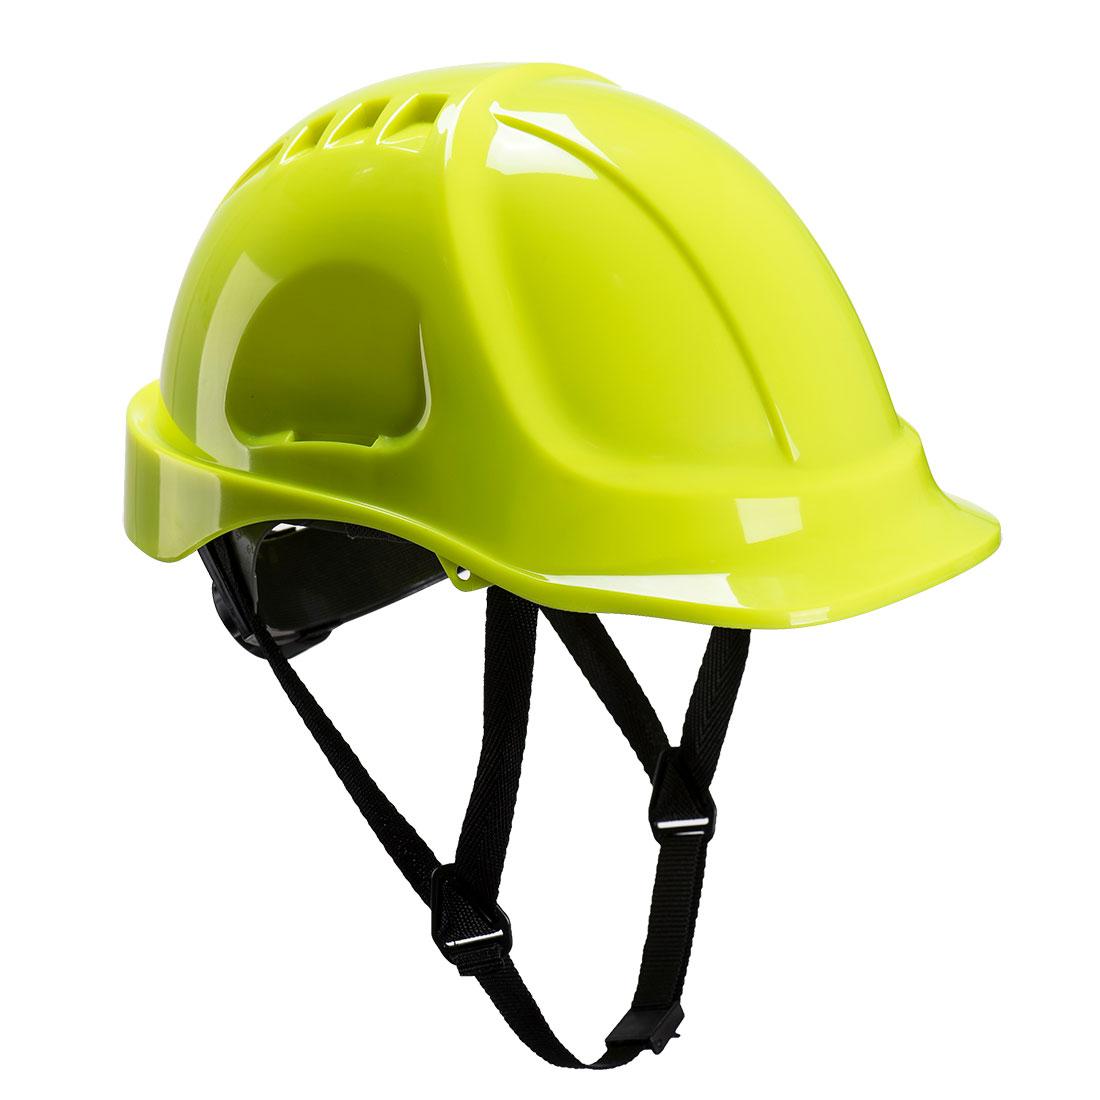 Endurance Plus Helmet Yellow